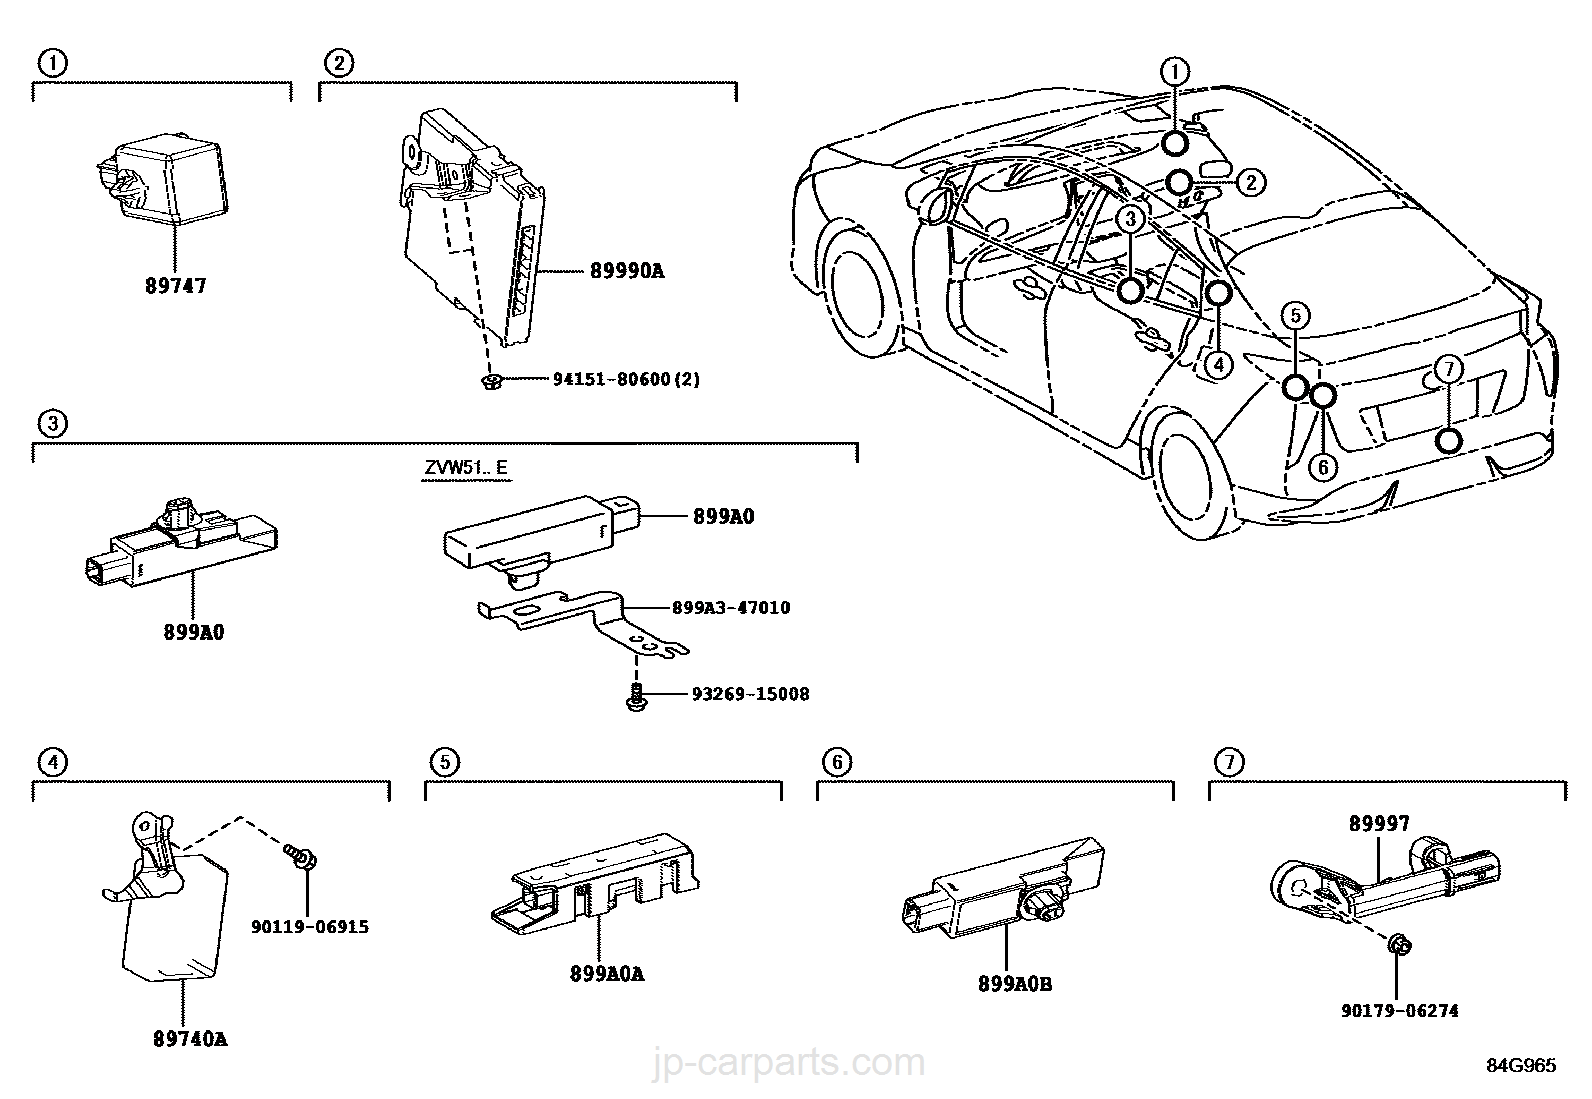 Astonishing Car Door Lock Parts Names Pictures - Plan 3D house ...